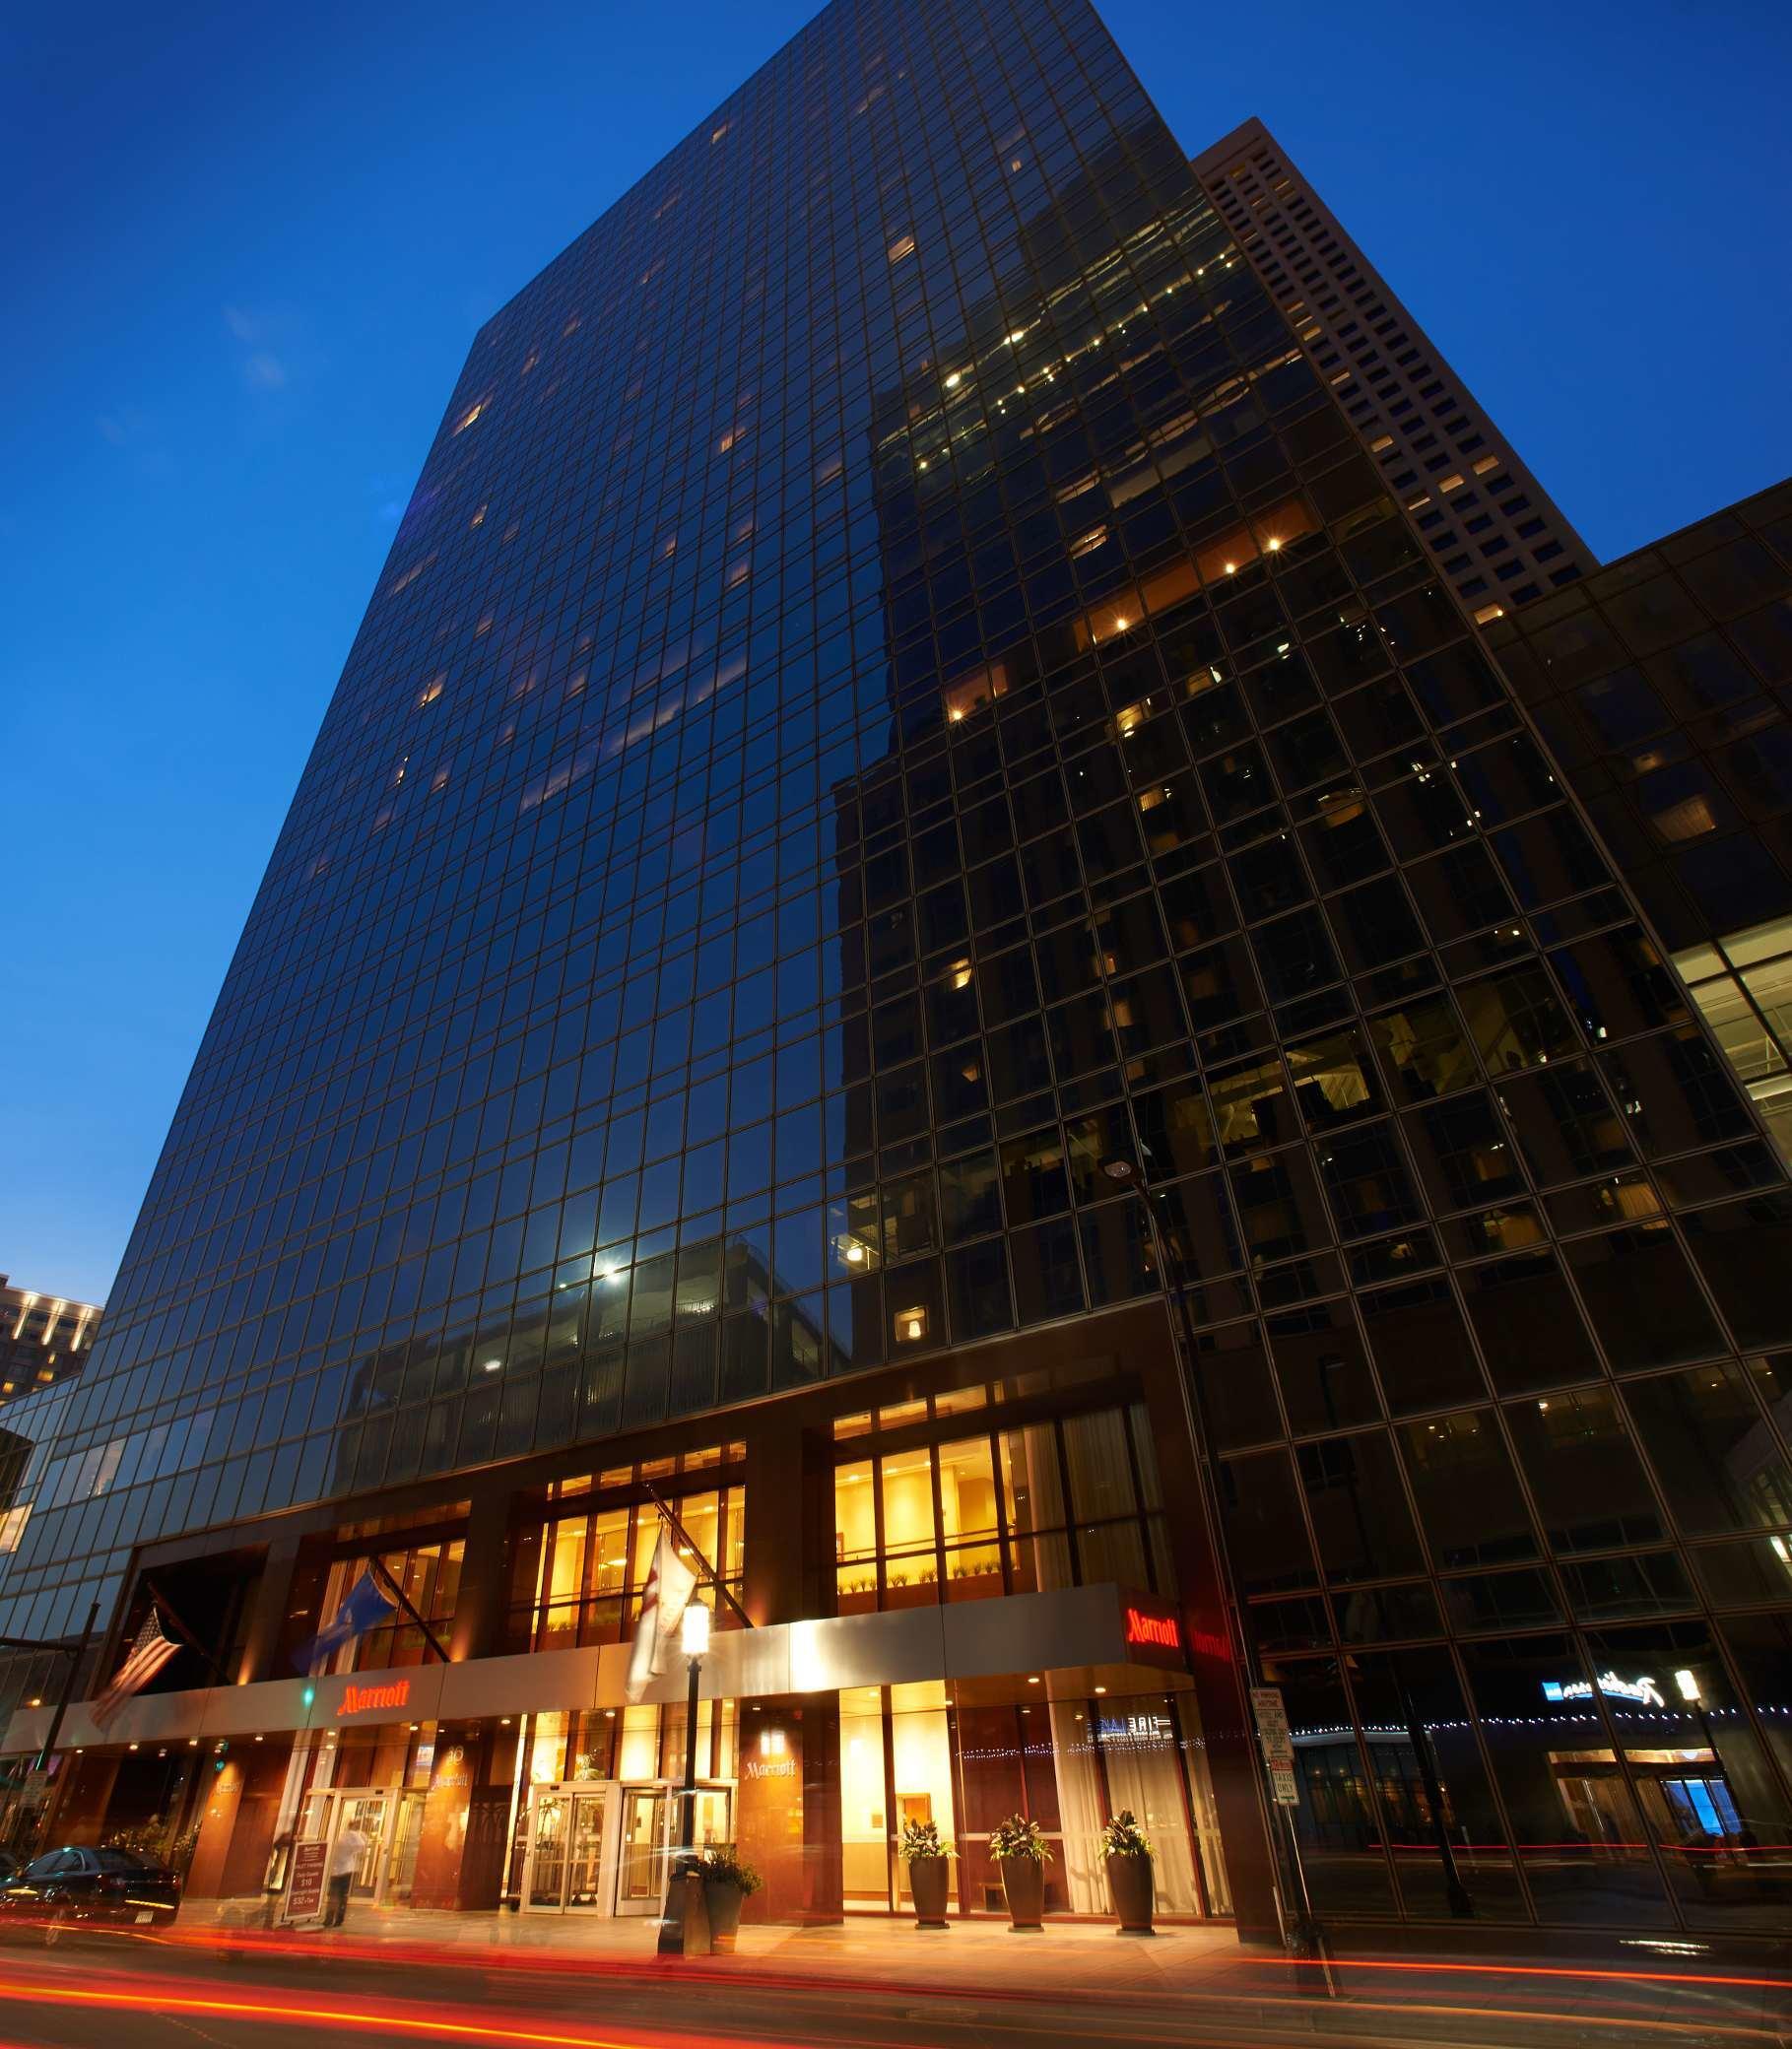 Citycenter: Minneapolis Marriott City Center, Minneapolis Minnesota